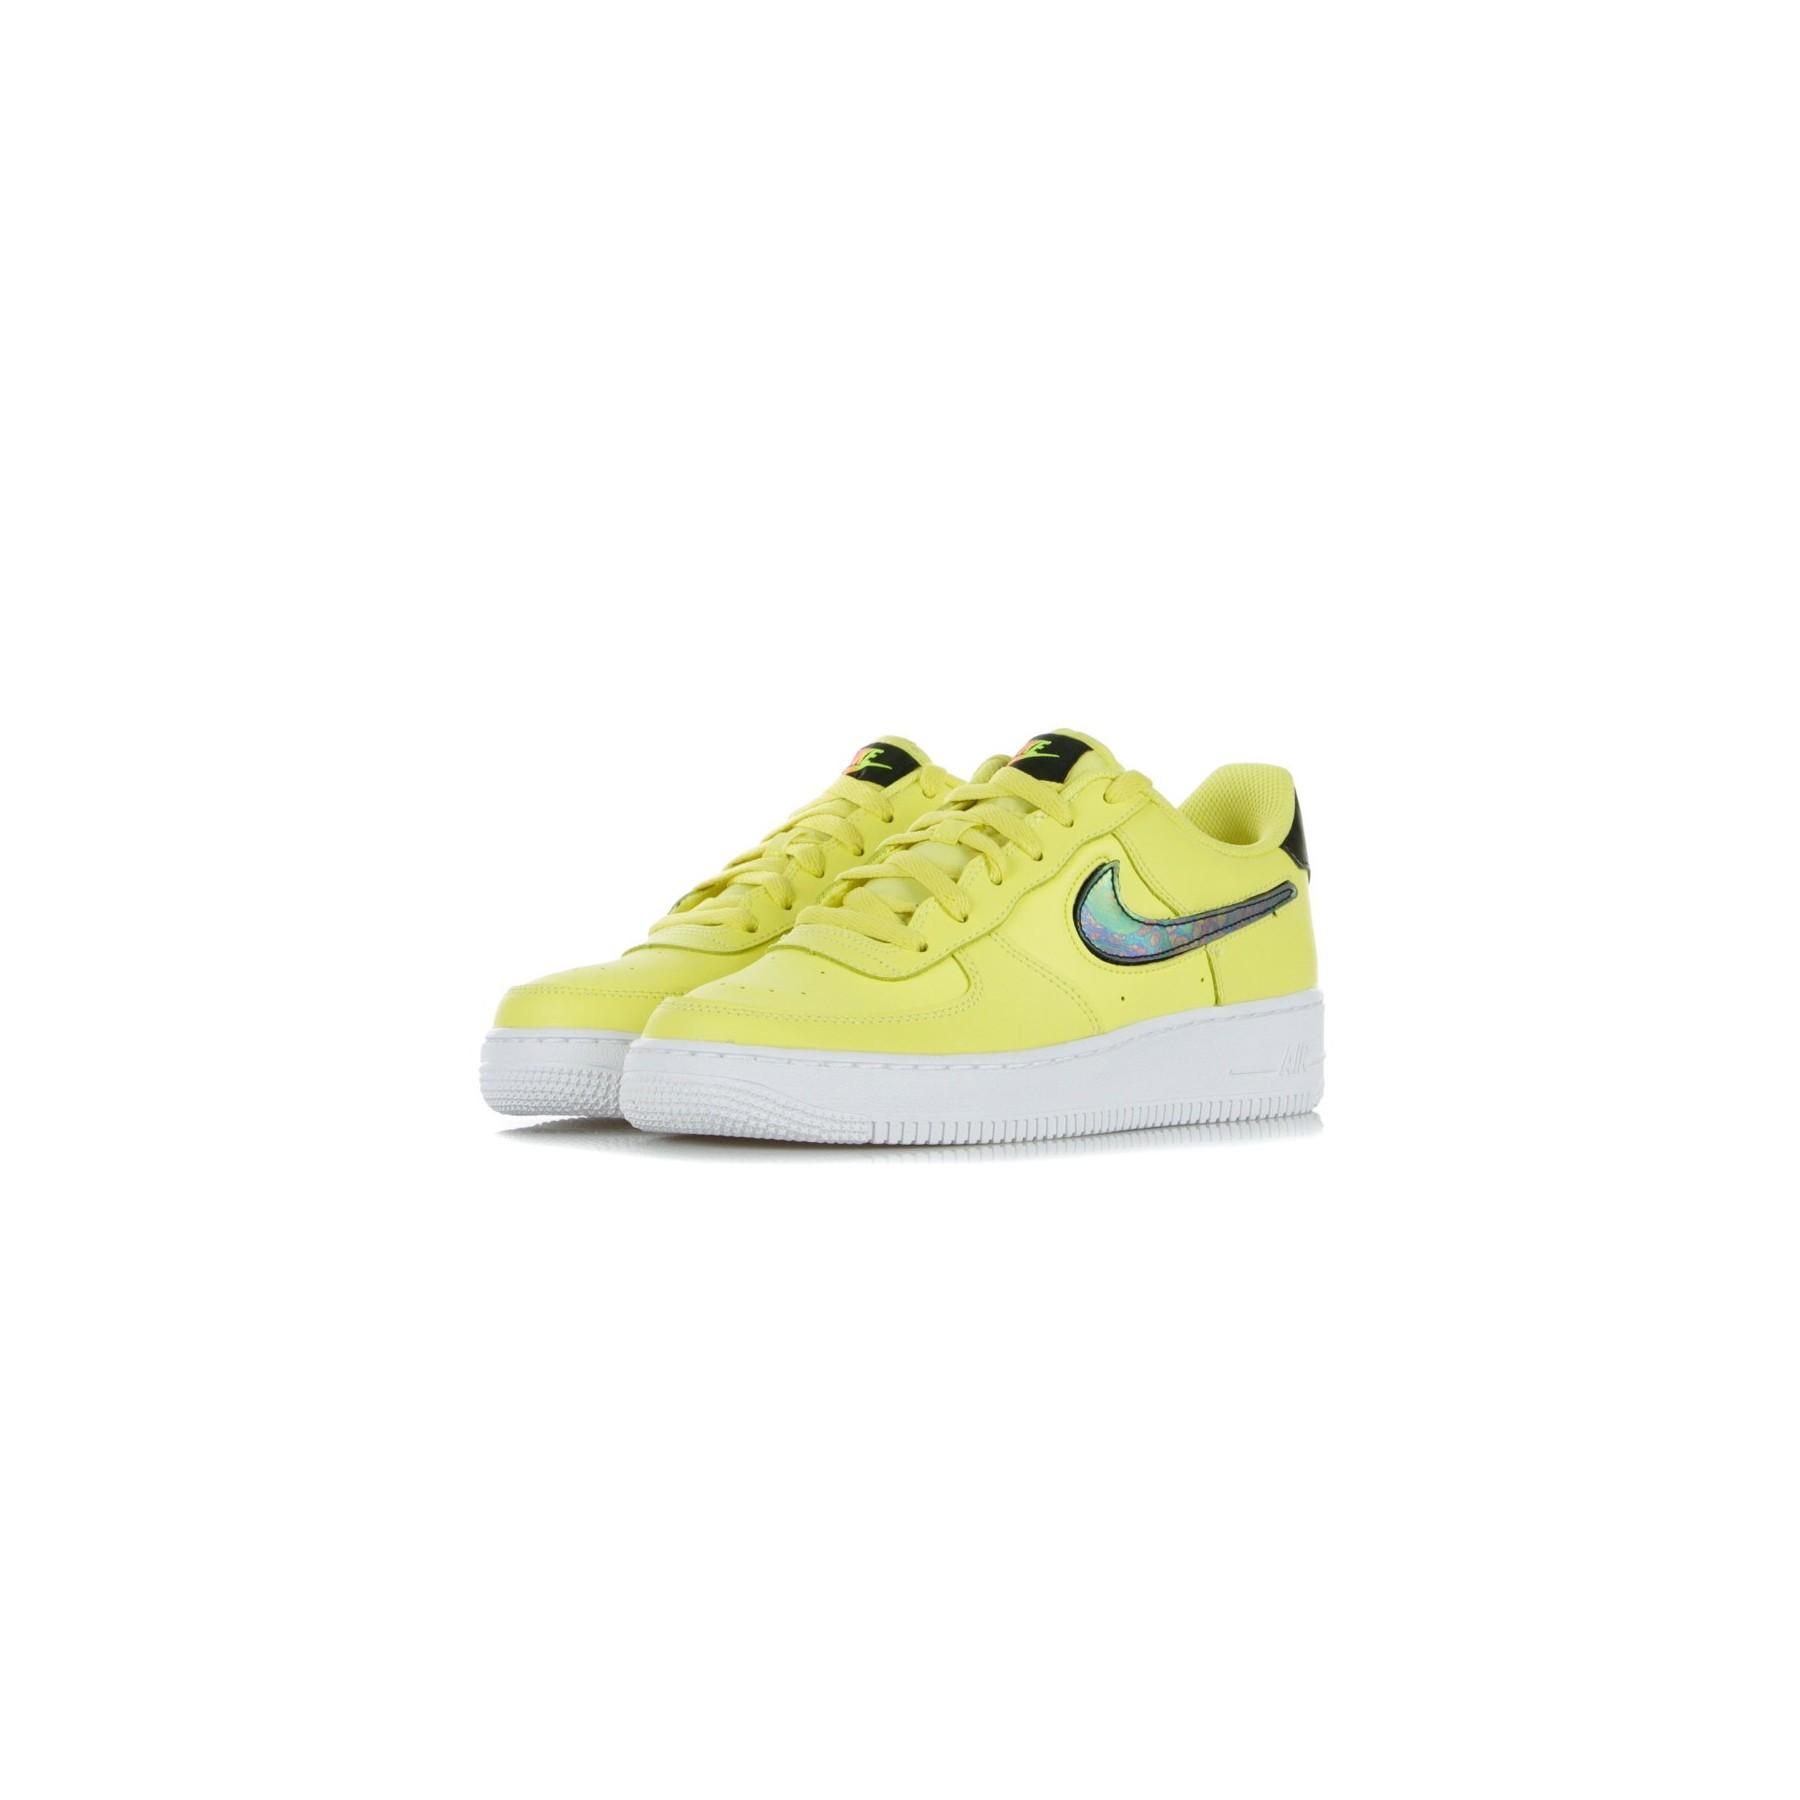 Großhandel 2019 Designer Nike Michael Jordan Shoes 11 XI Herren Basketball Schuhe Concord Bred Oliv Lux Platin Farbton Space Jam UNC 2019 XI Designer